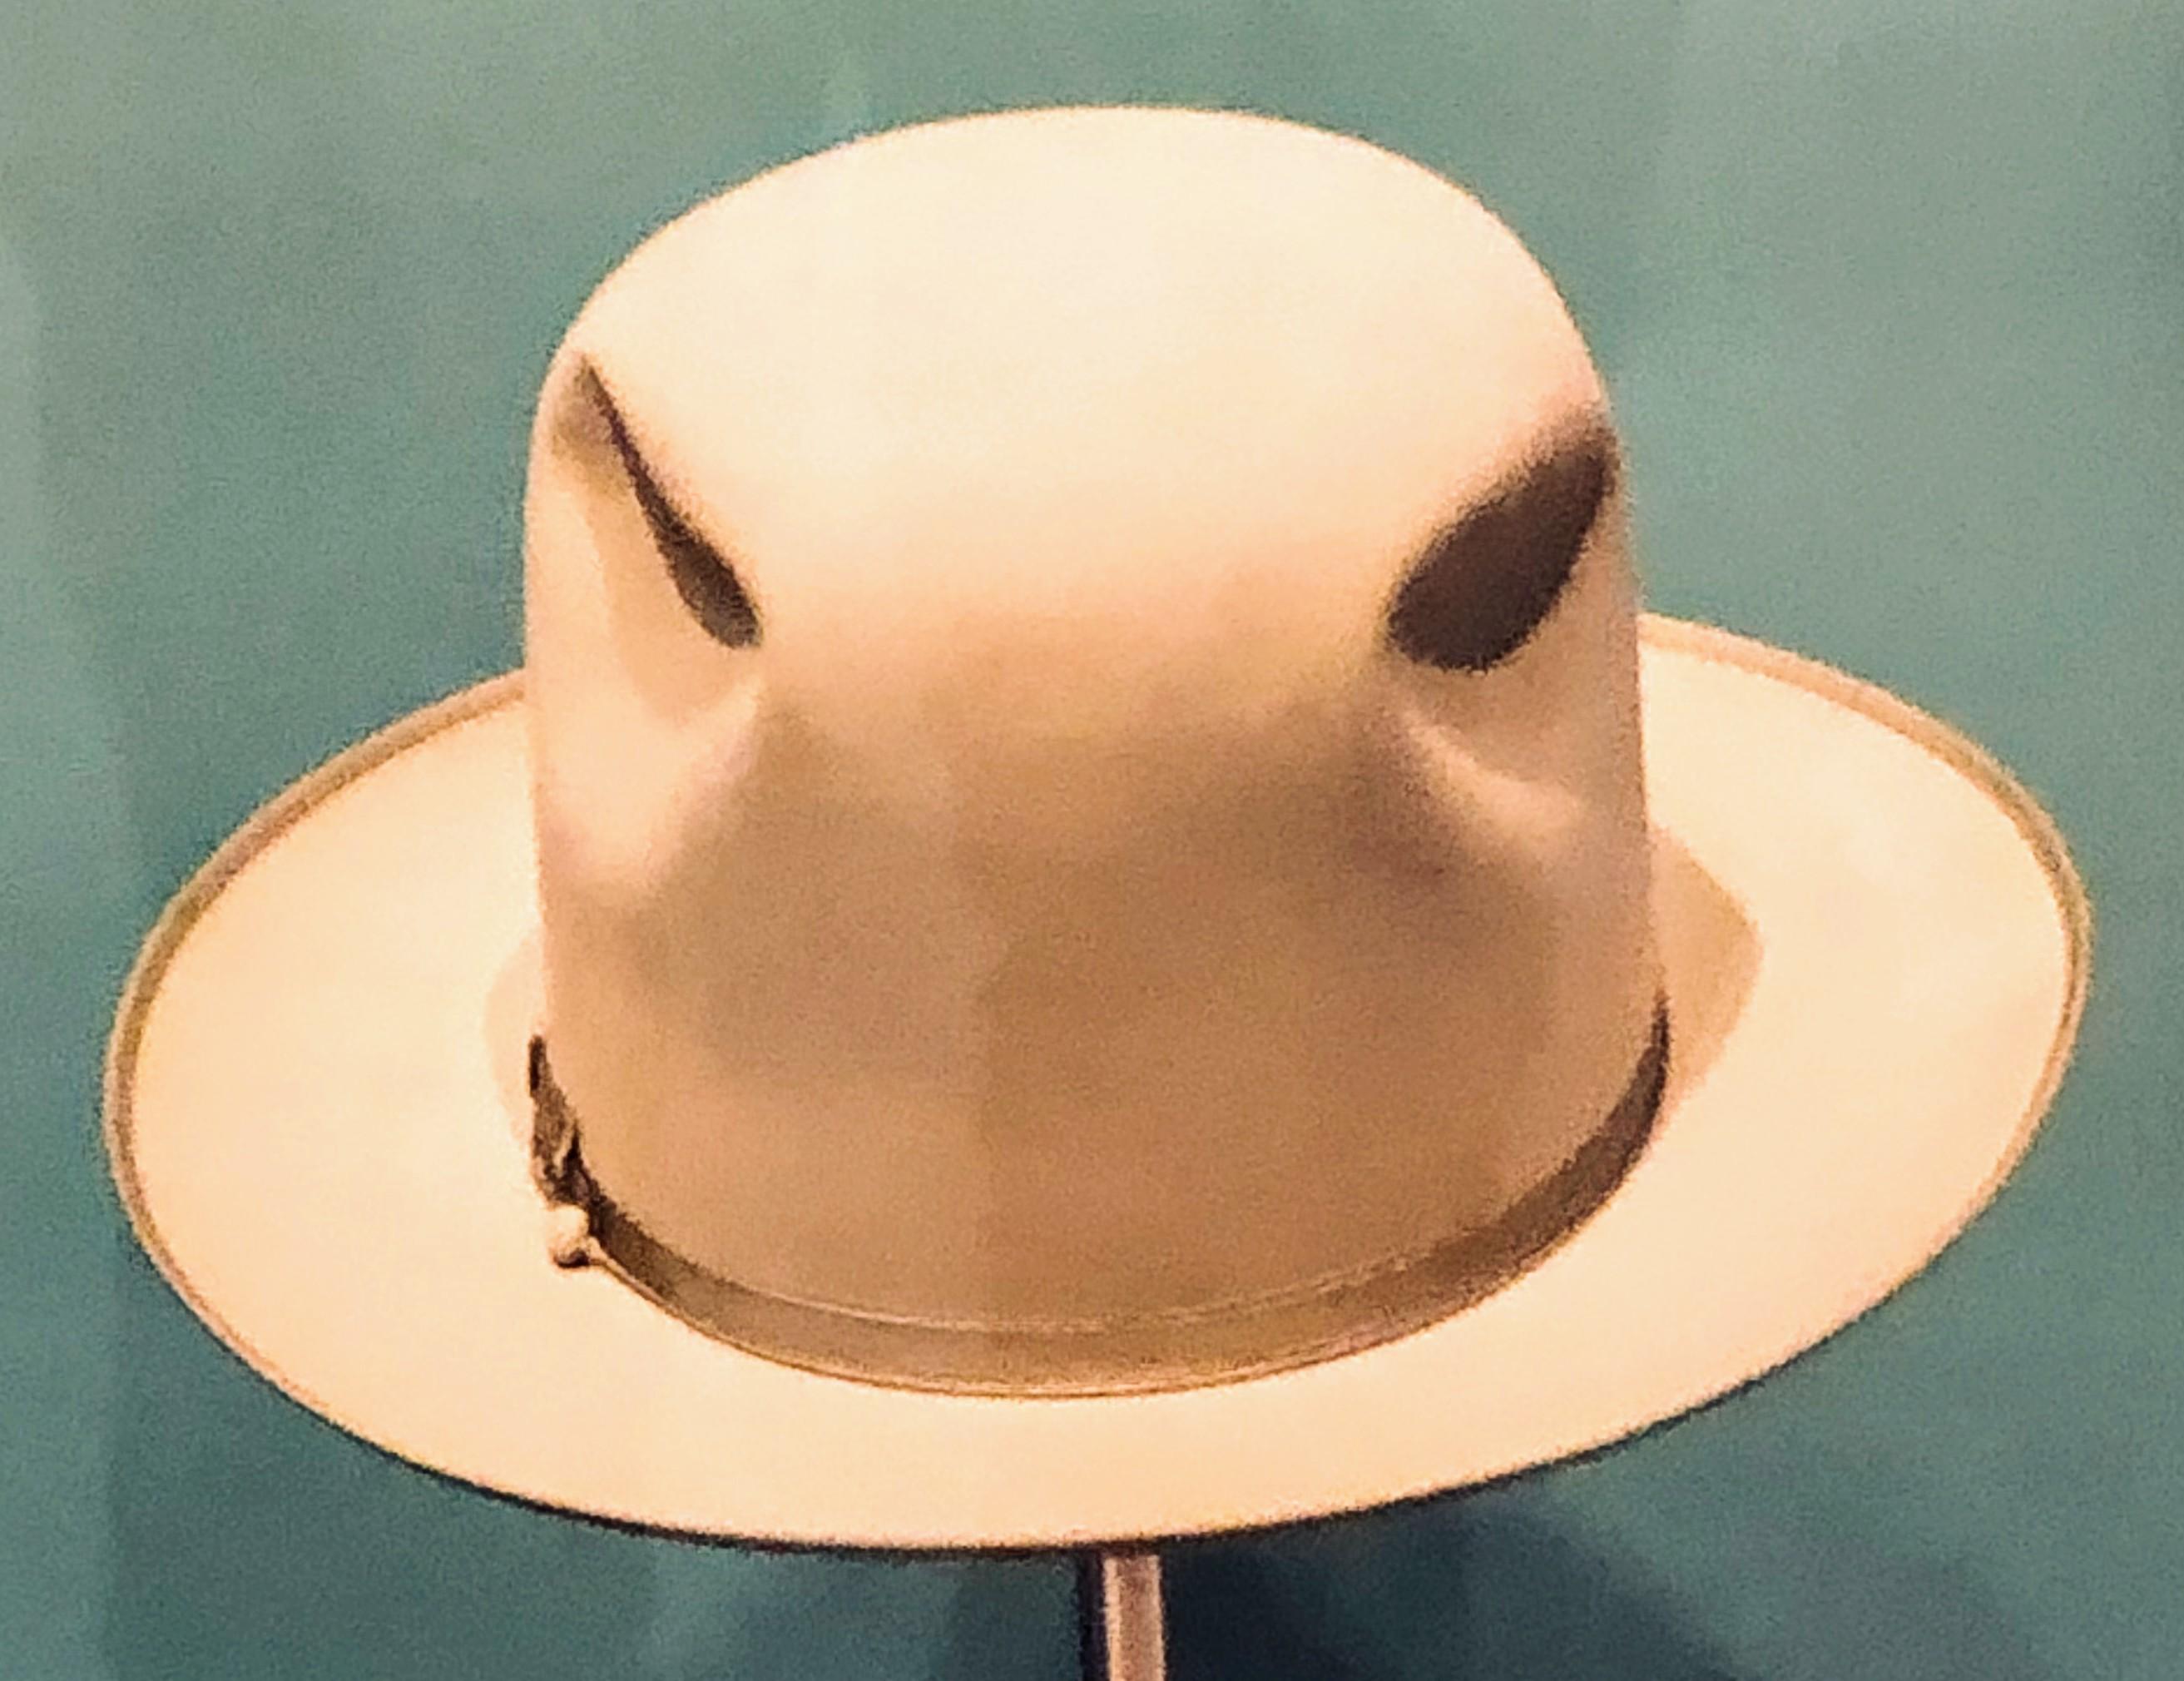 LBJ's hat